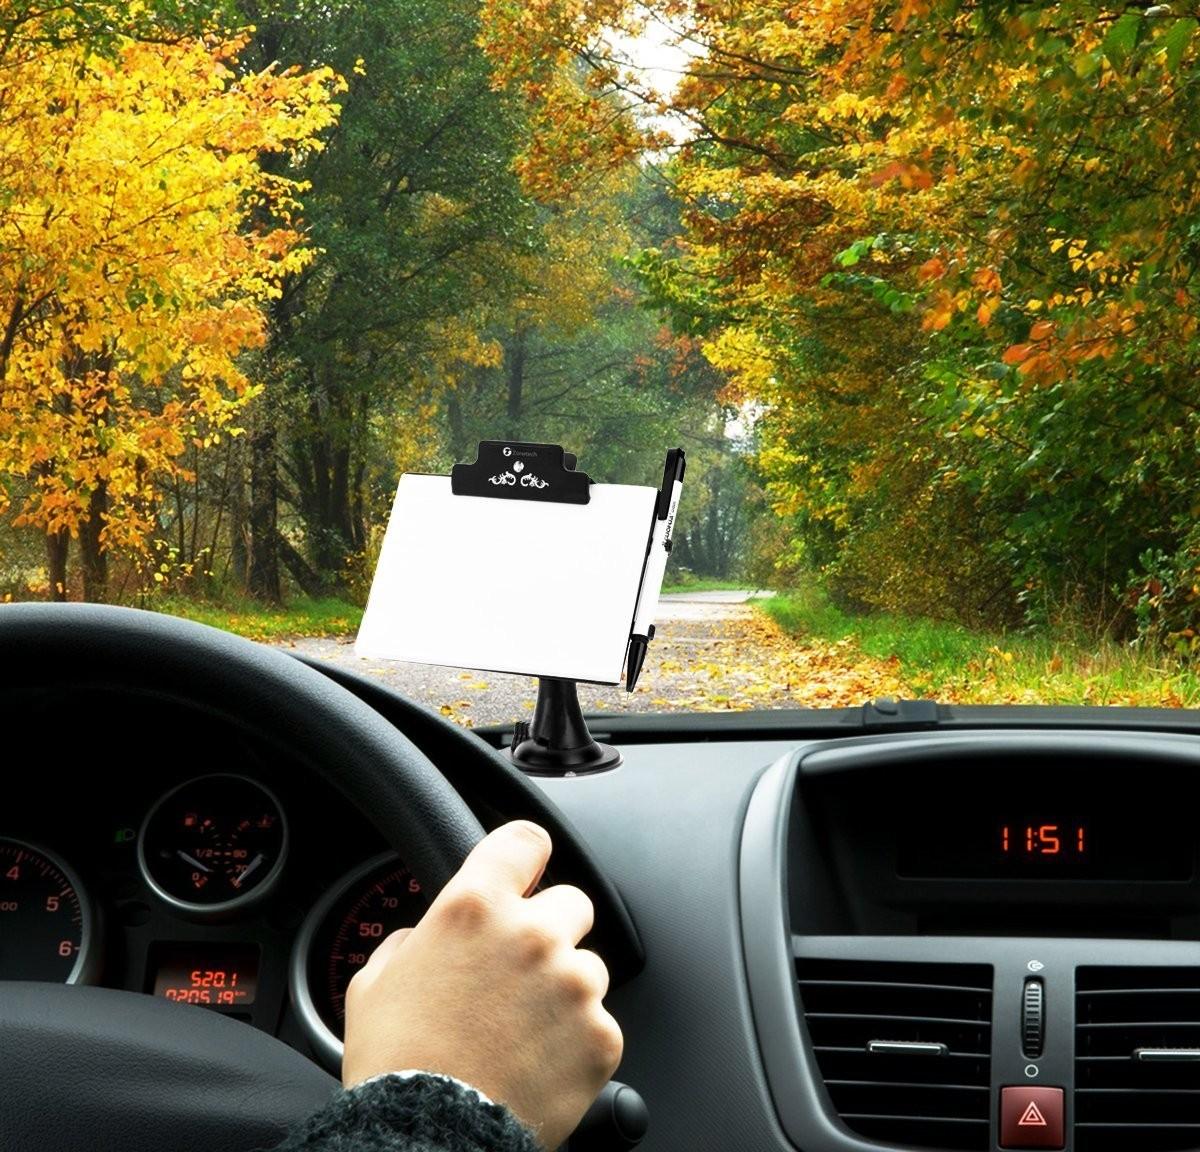 Auto Accessories Headlight Bulbs Car Gifts Dashboard